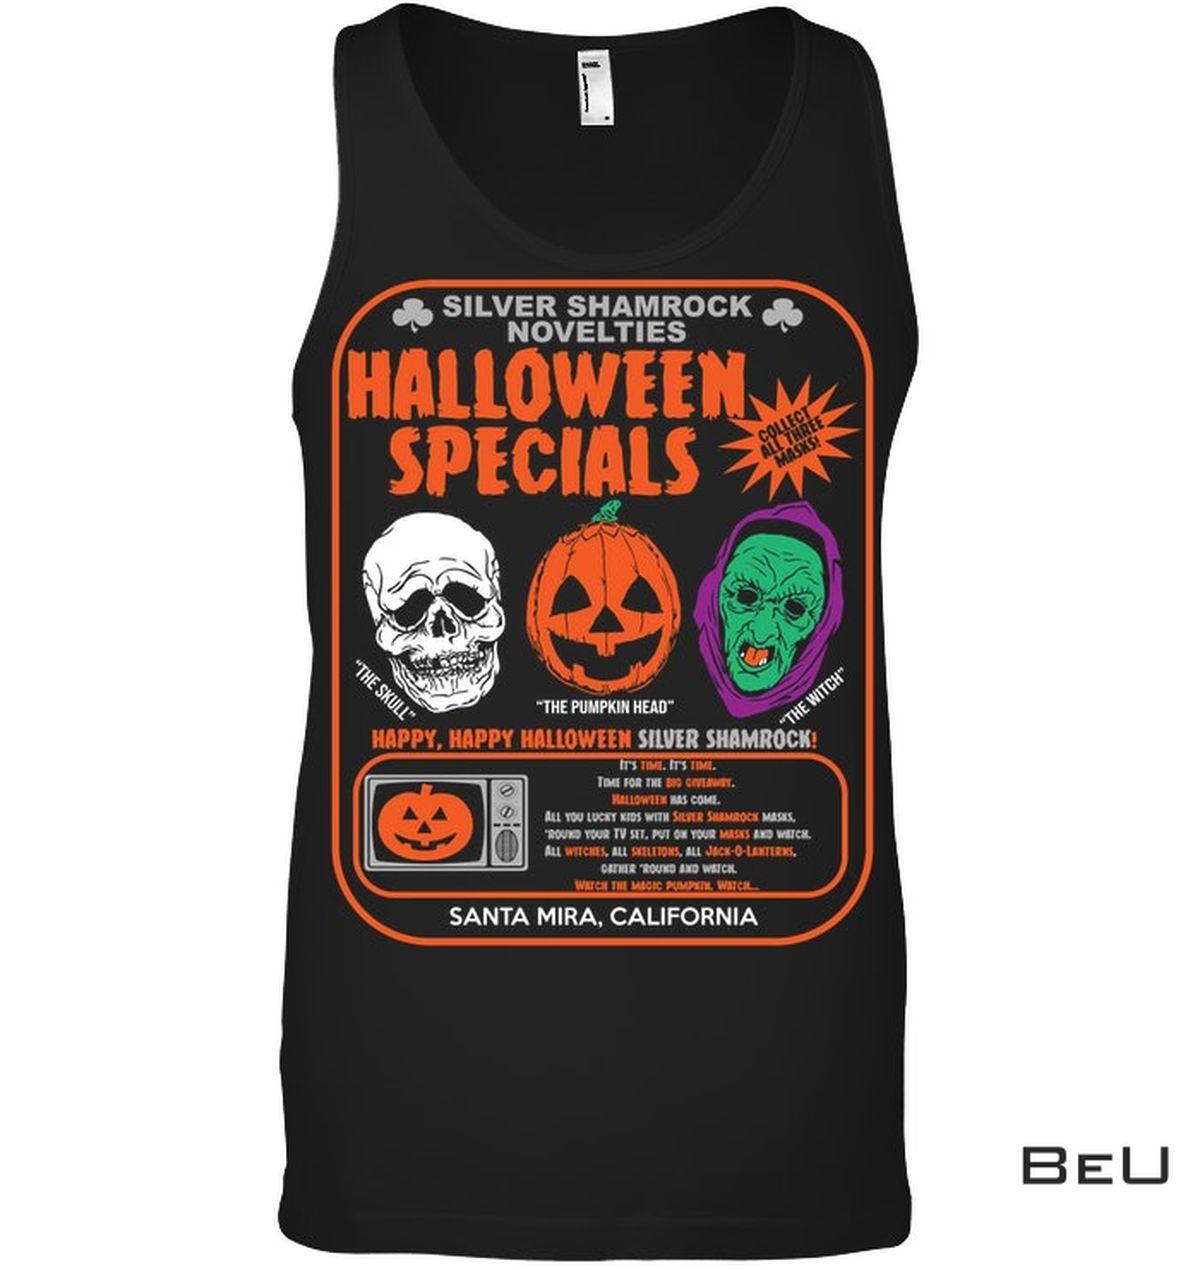 Unique Silver Shamrock Novelties Halloween Specials Shirt